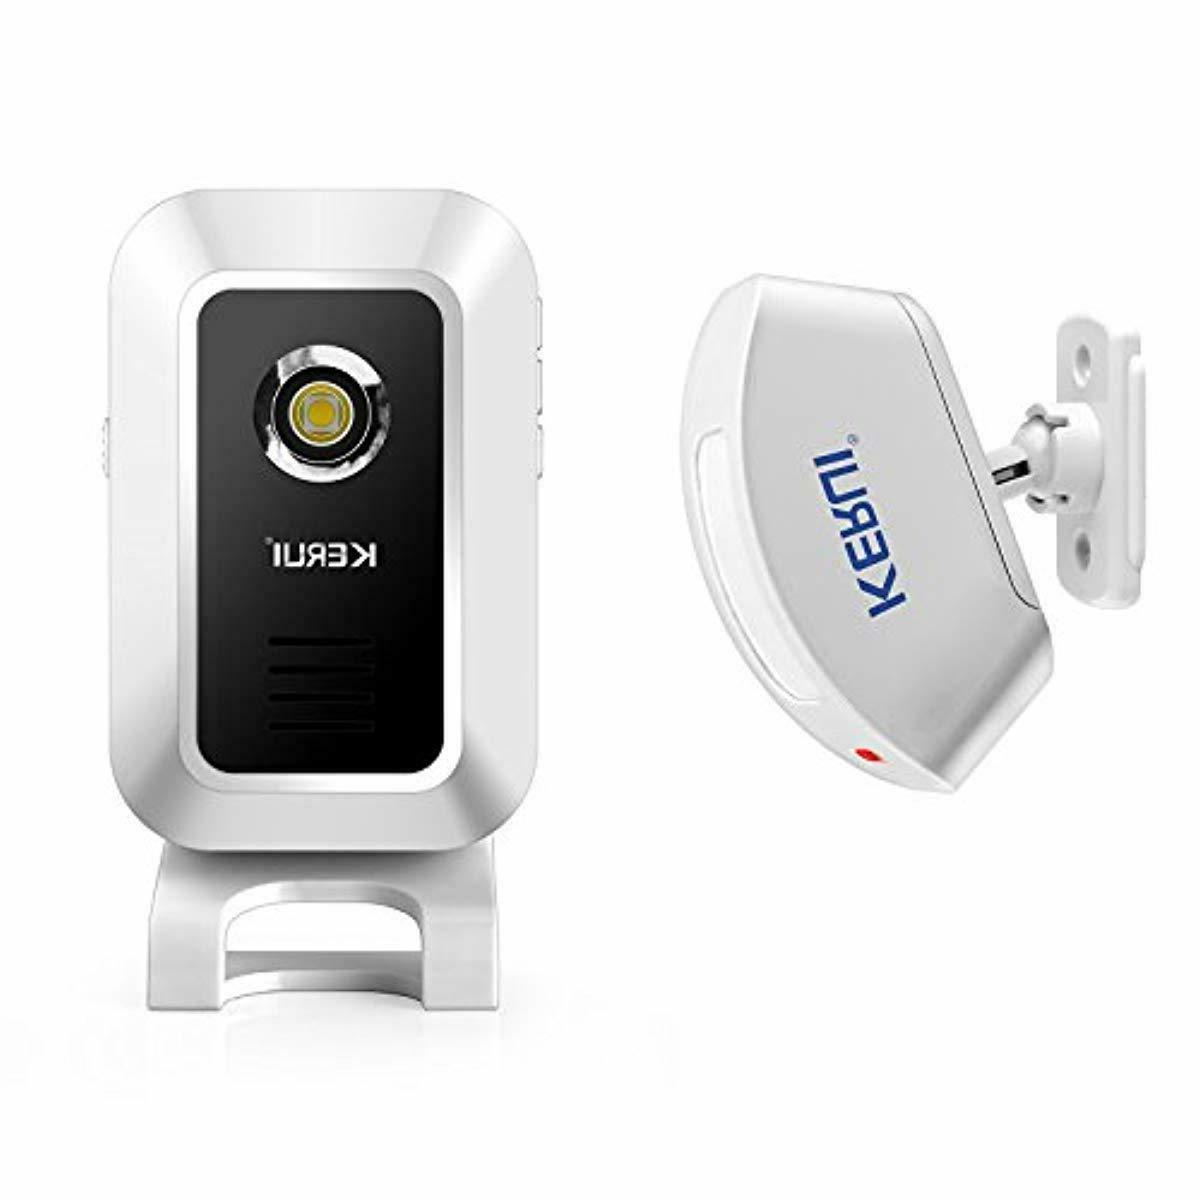 wireless split welcome motion sensor alert alarm